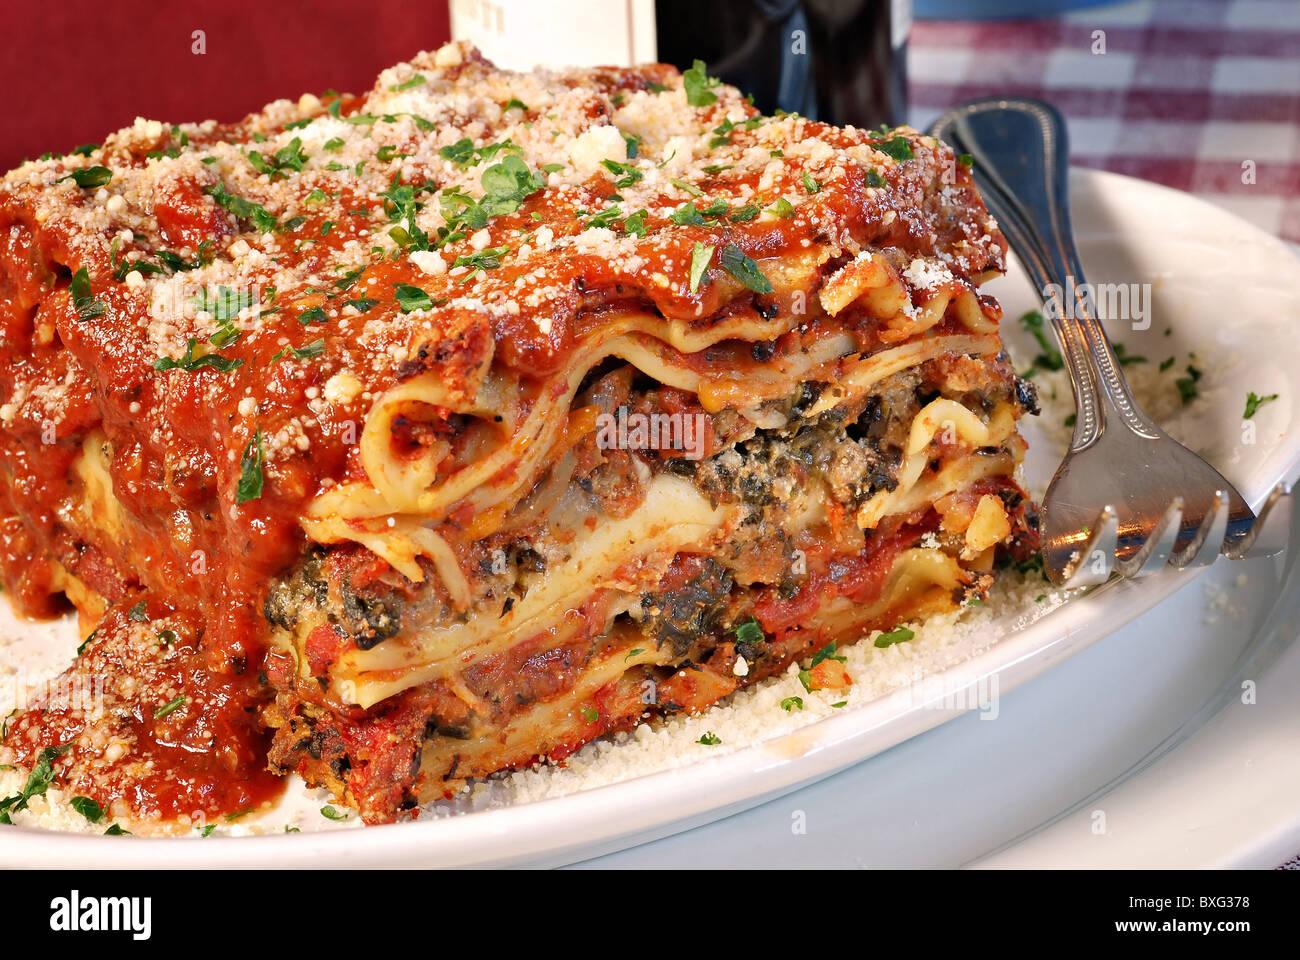 Plate of lasagna at an Italian restaurant Stock Photo